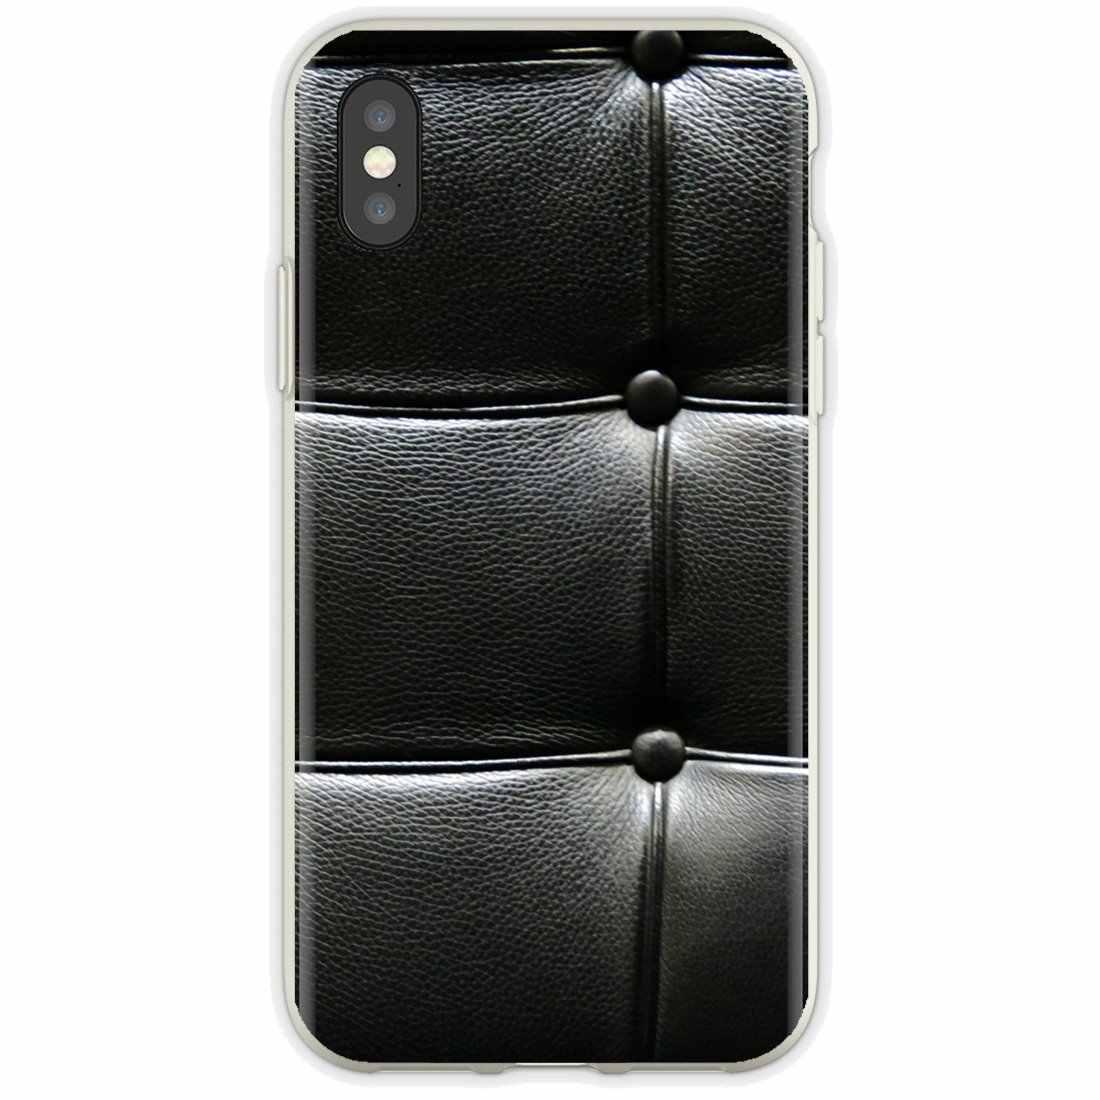 Suave funda para Xiaomi Mi5 Mi5S Mi6 Mi3 Mi4 Mi4i Mi4C Redmi nota 2 3 3S 5 5A 6 6A Pro texturas de cuero